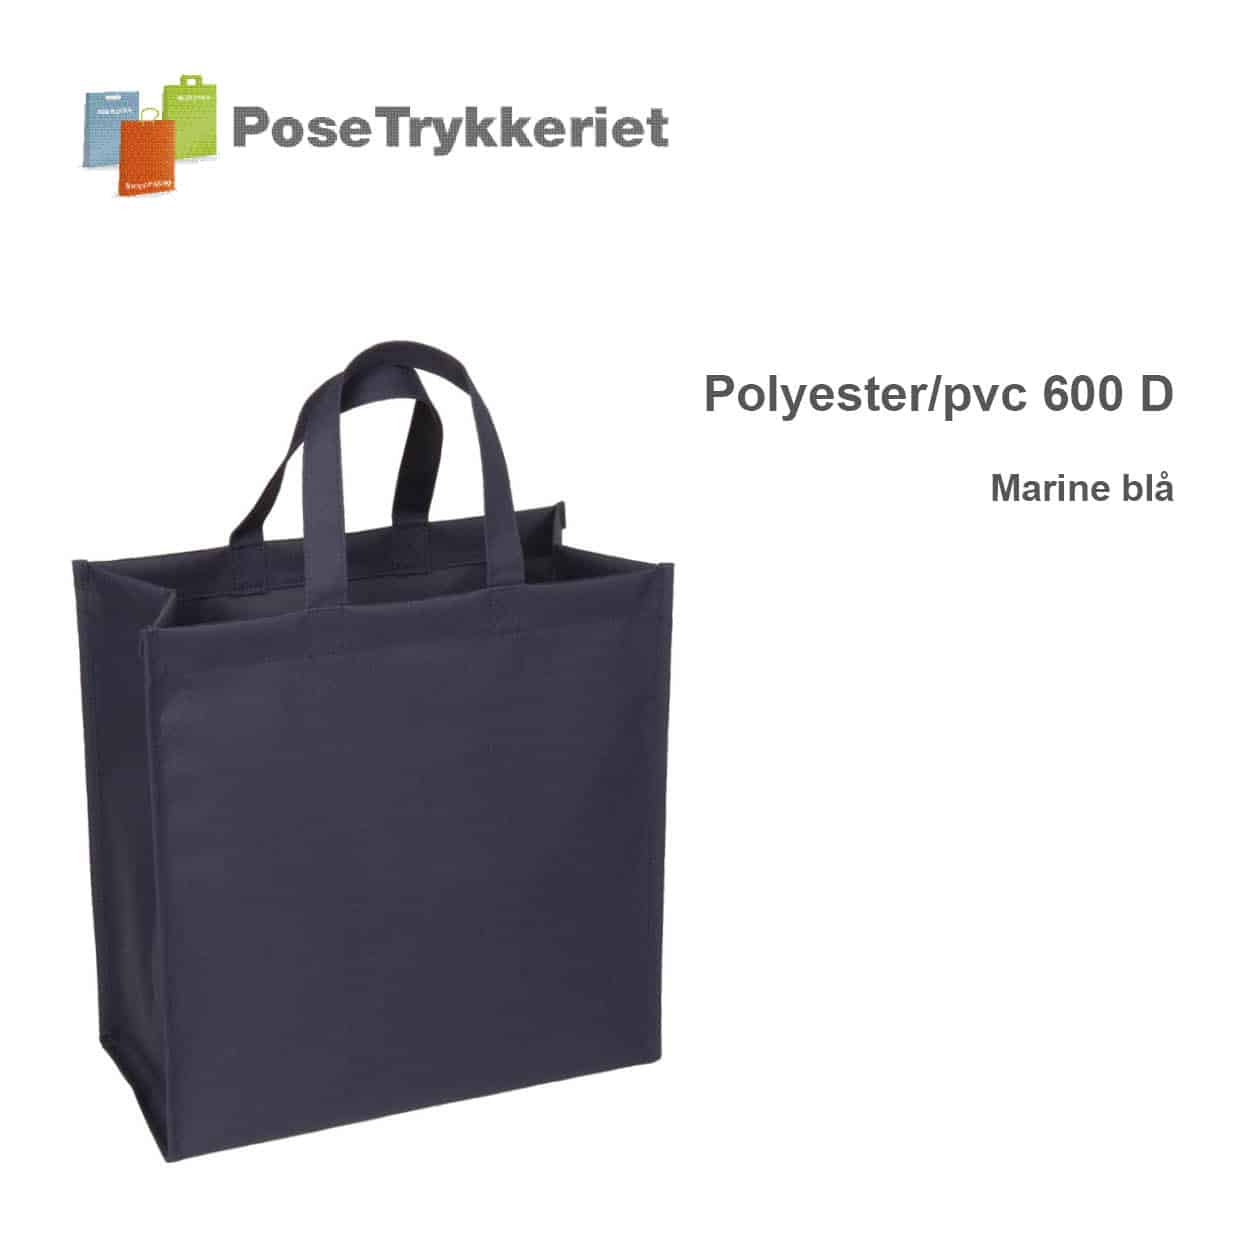 Marine blå revisorpose 600 D. PoseTrykkeriet.dk